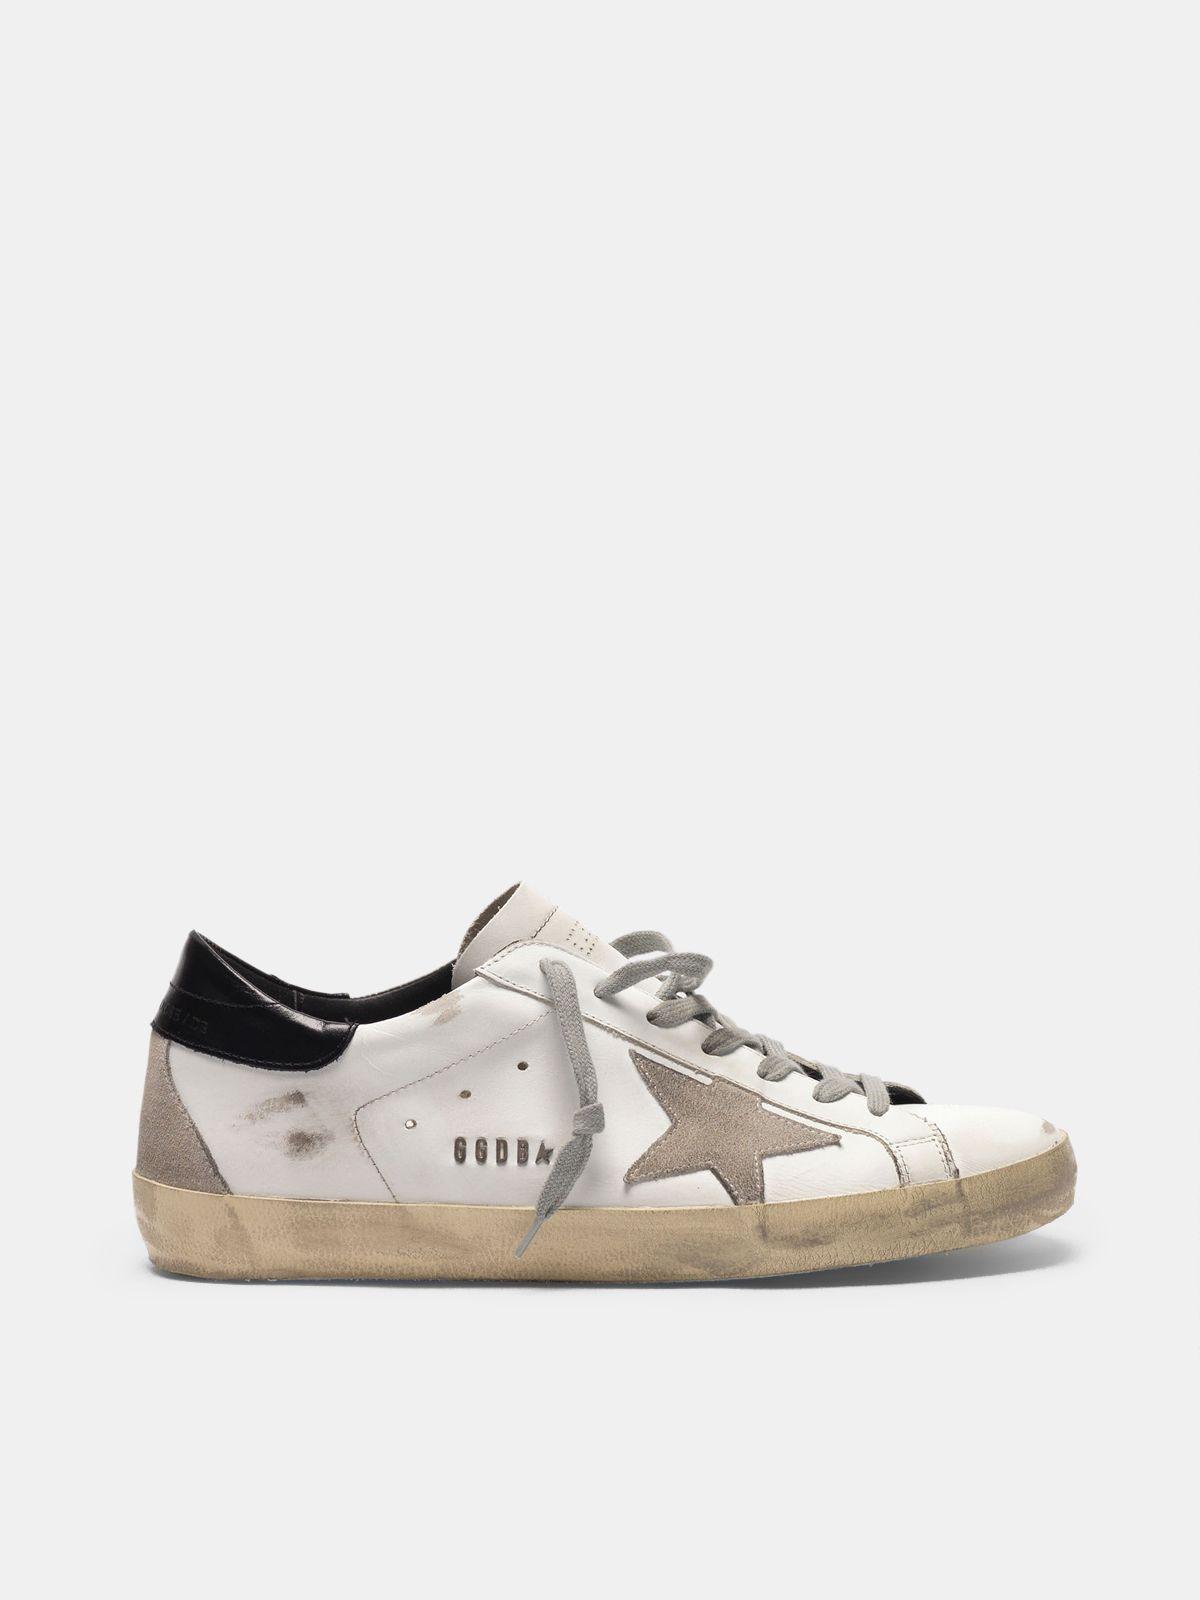 Golden Goose - Sneakers Super-Star con talloncino nero e metal studs lettering in